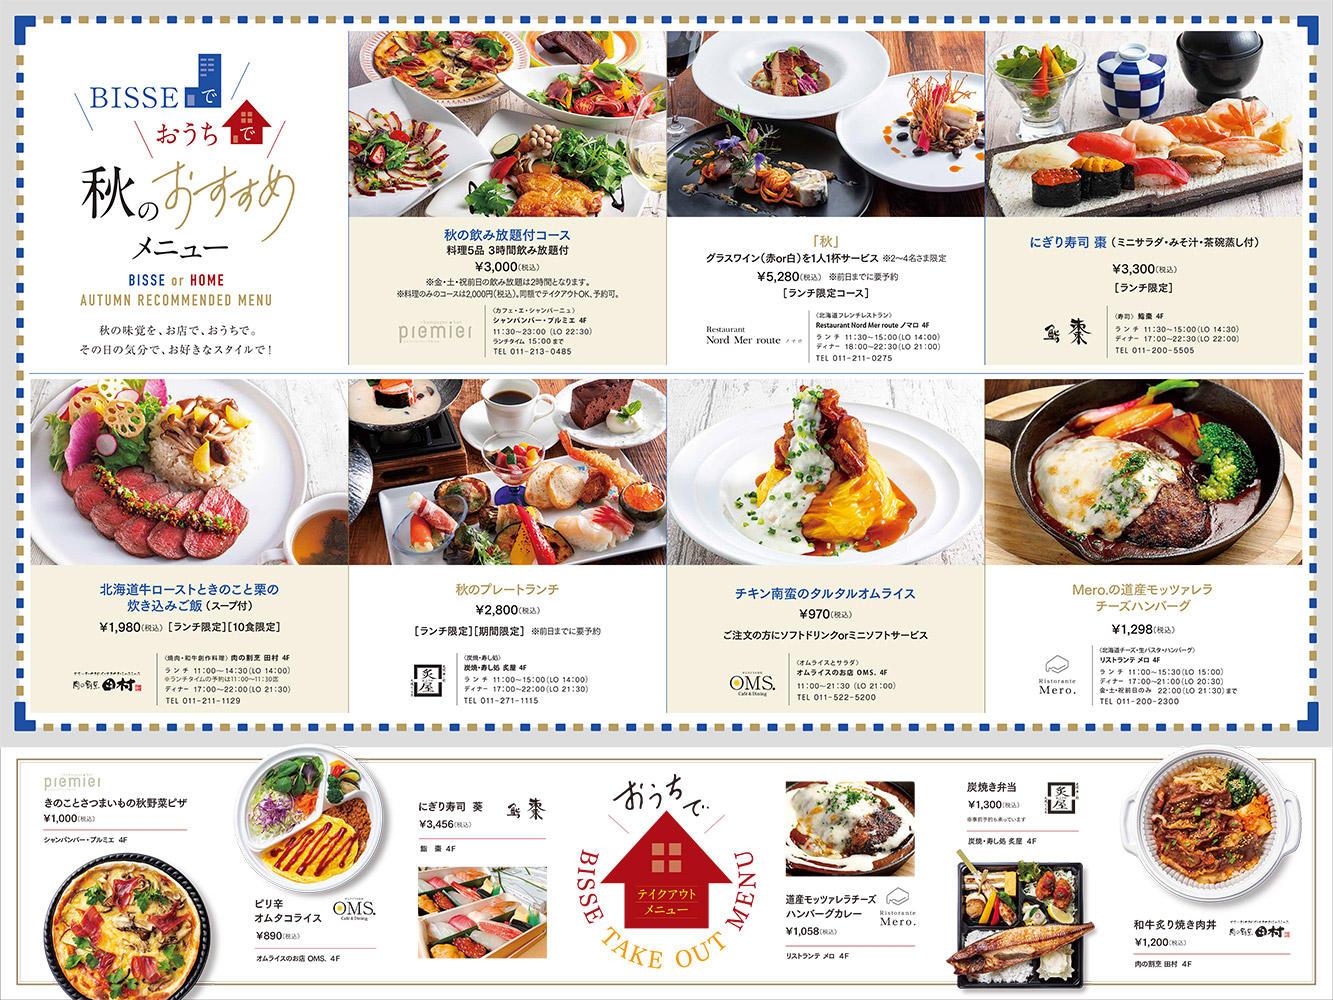 https://www.odori-bisse.com/info/news_210816_img2.jpg